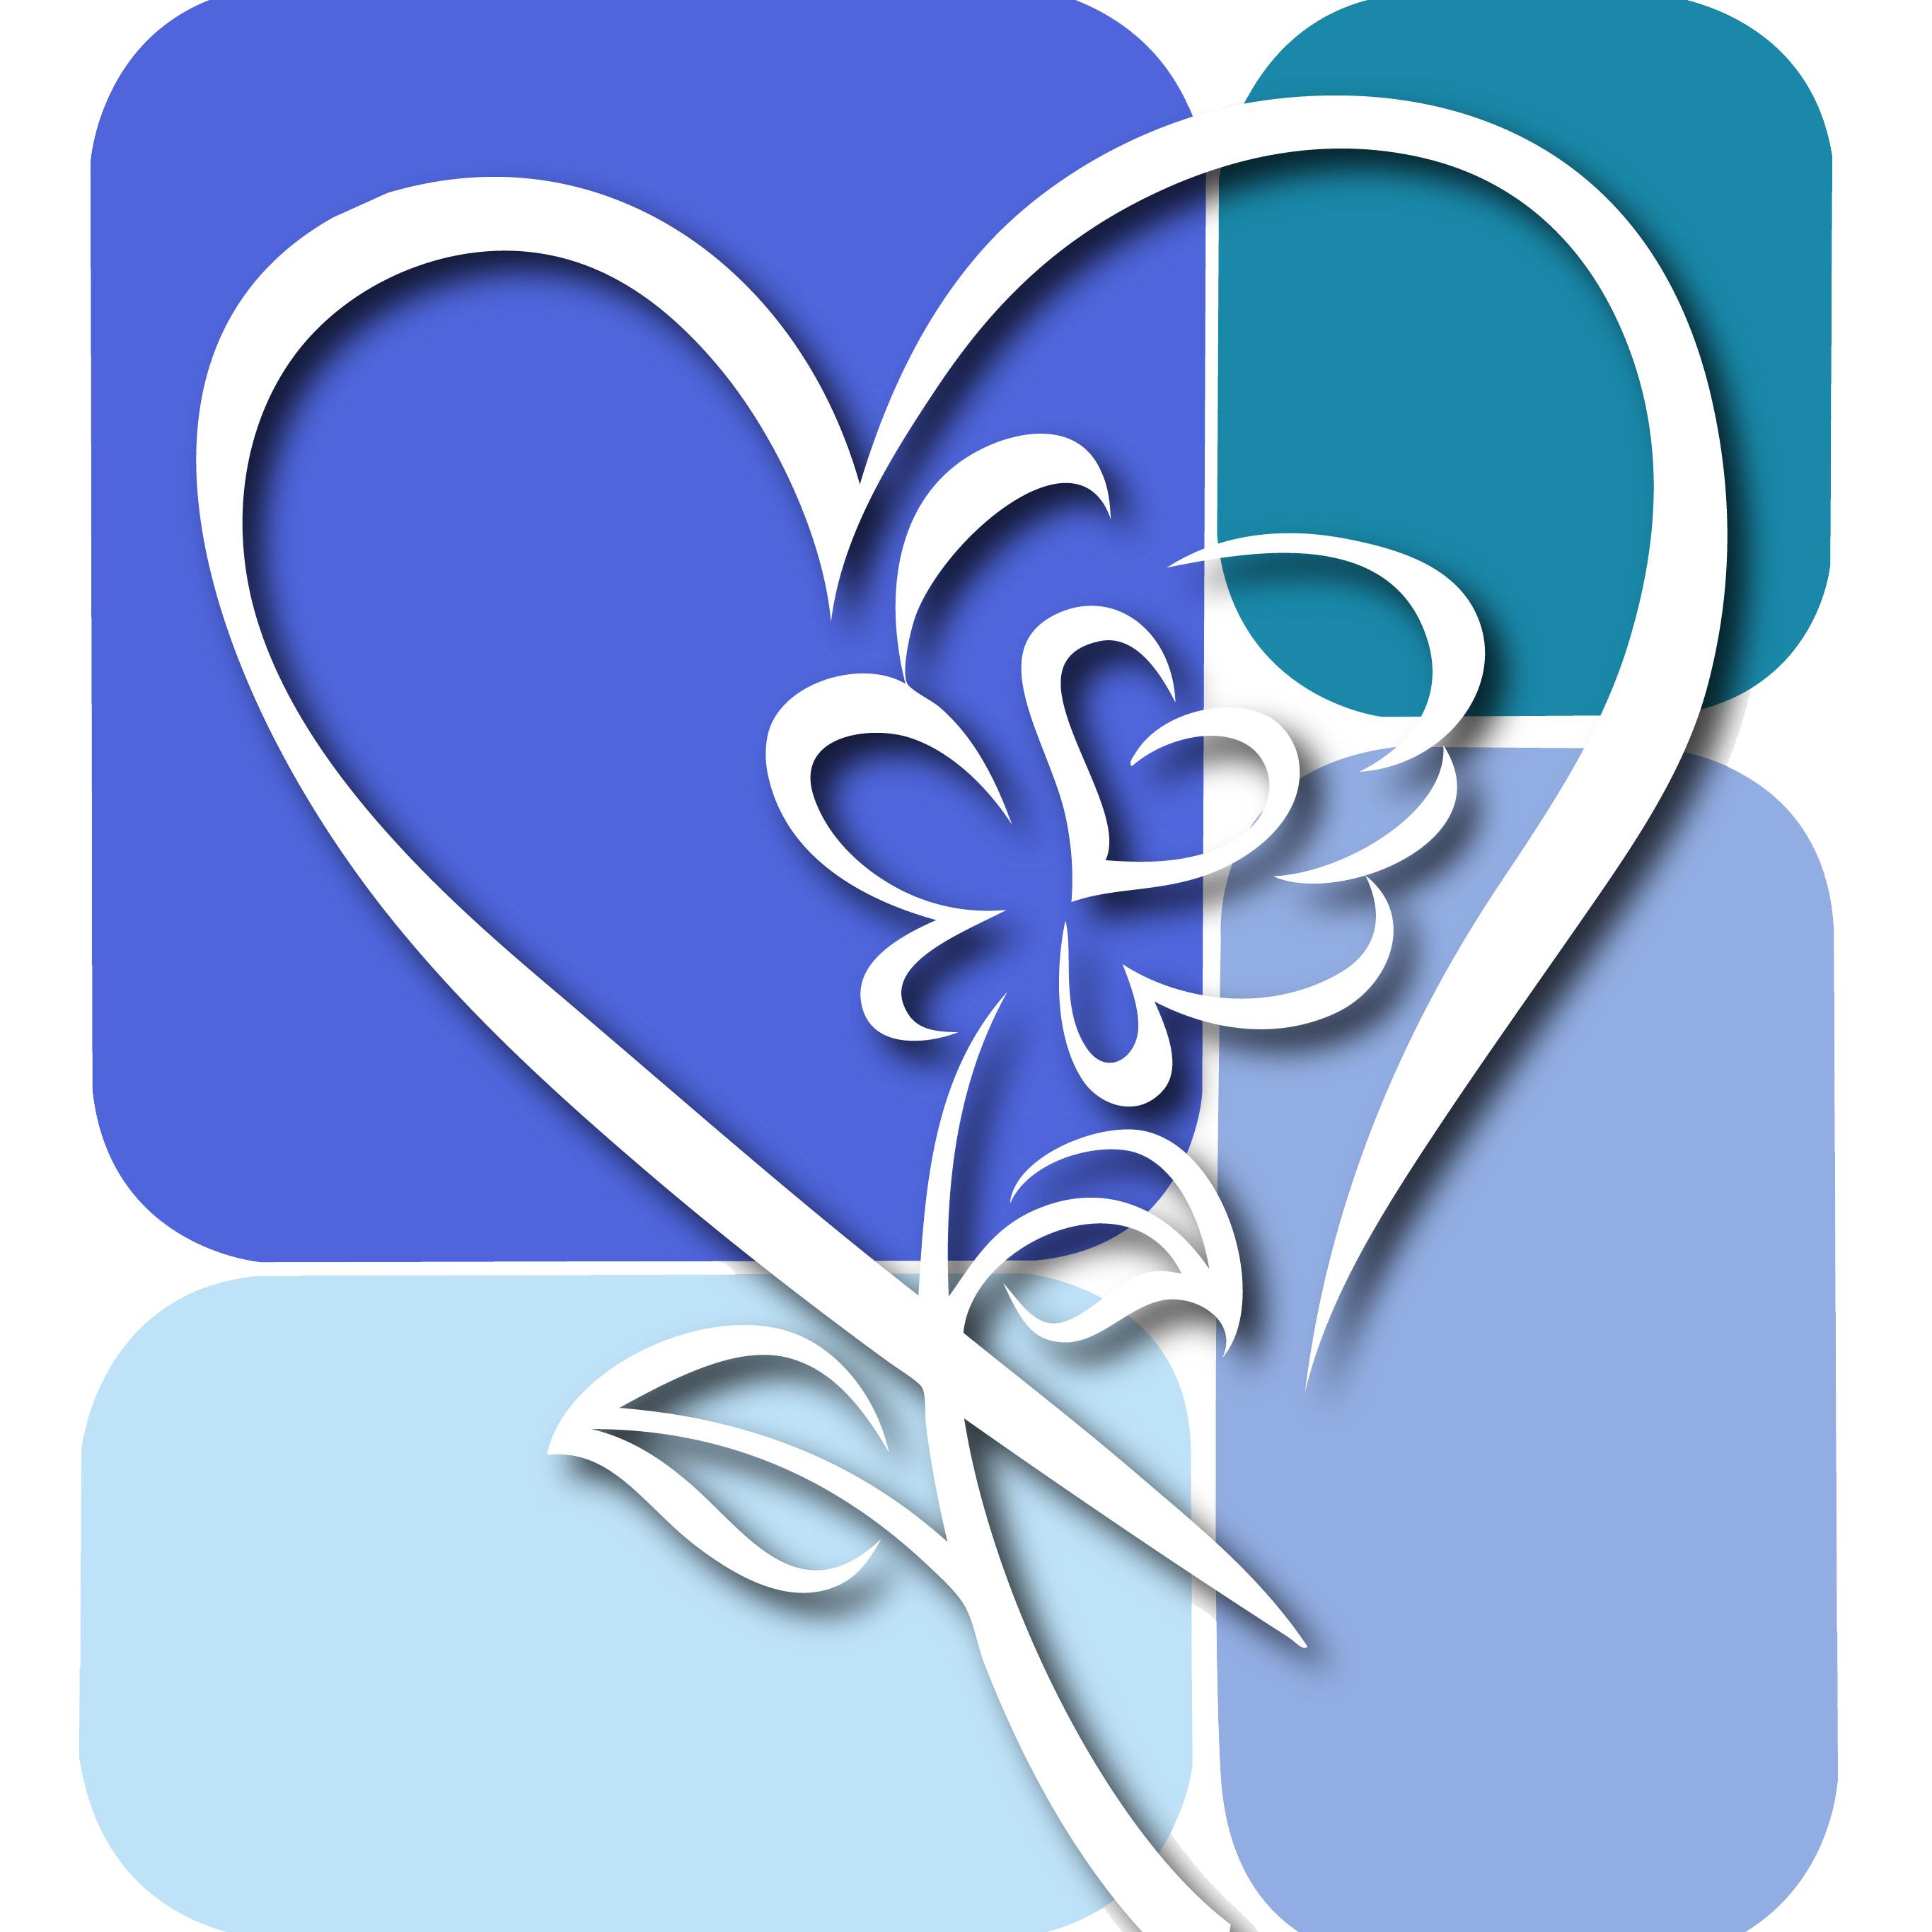 Holy Family Prenatal Care, LLC - Dayton, OH - Clinics